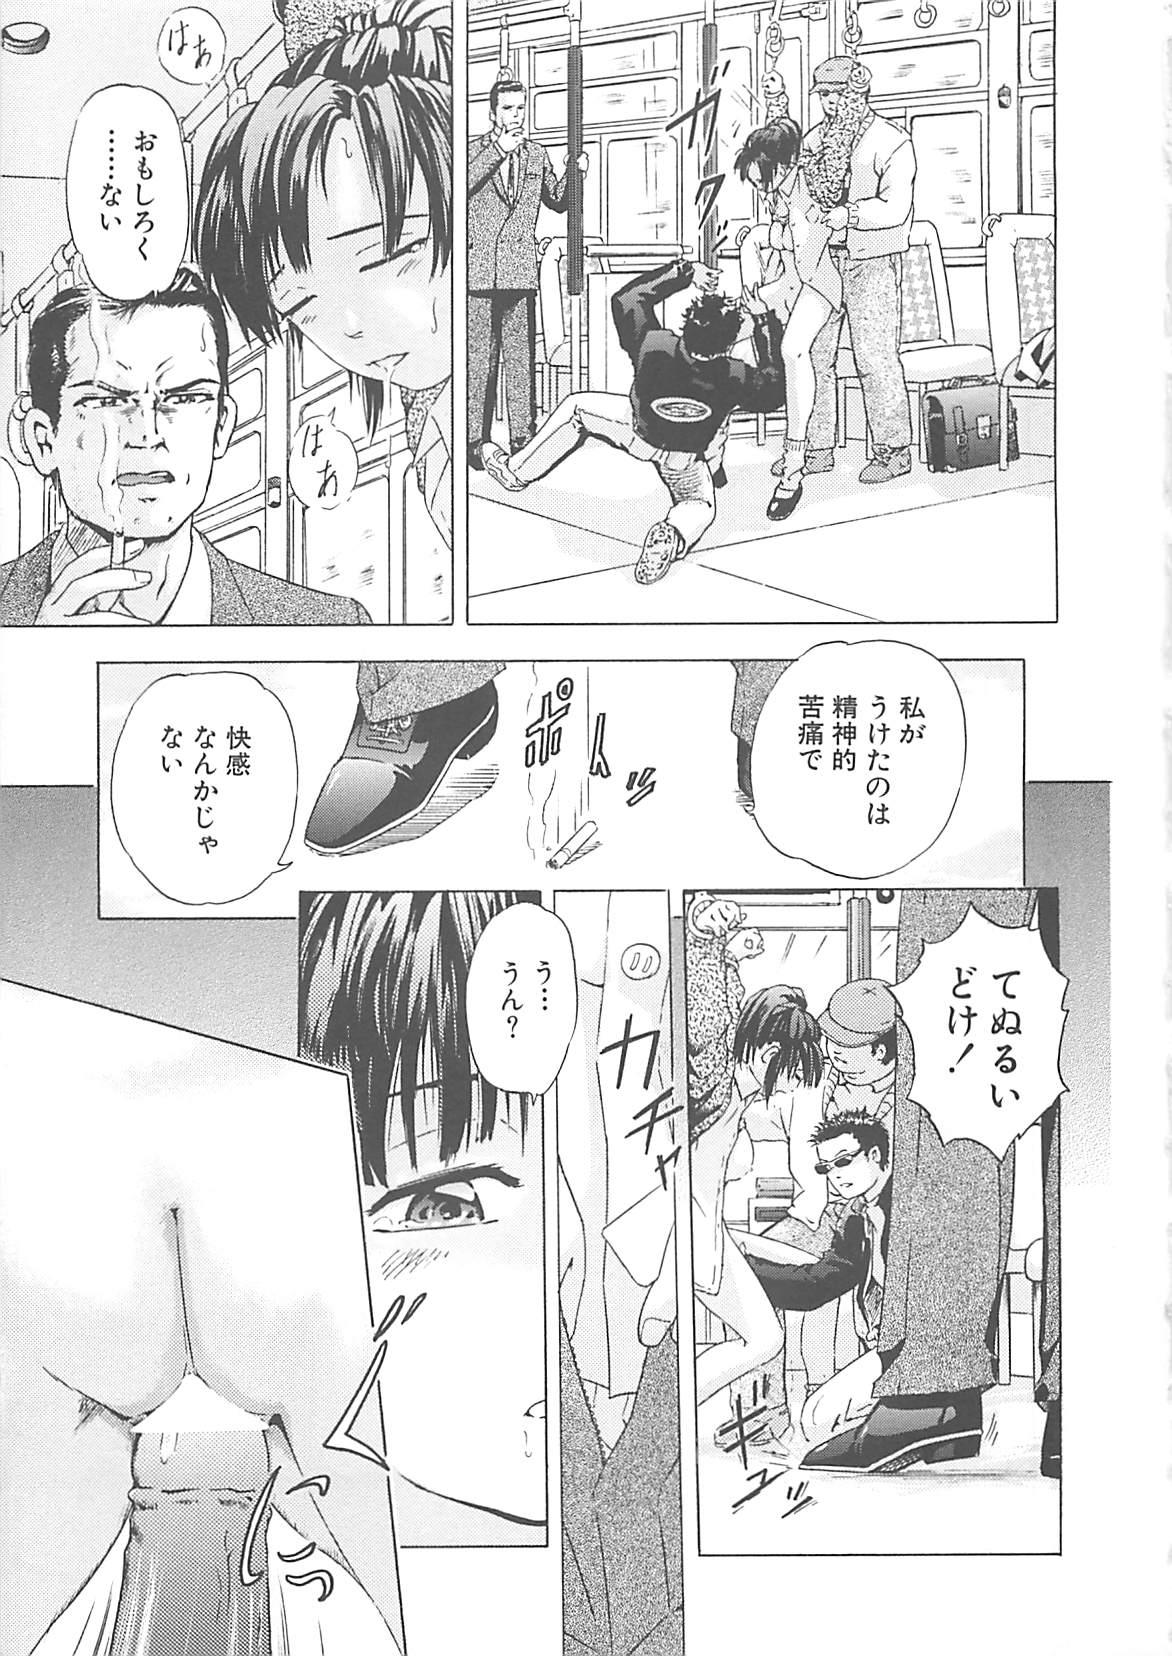 Kanin Kyoushitsu - Adultery Classroom 93